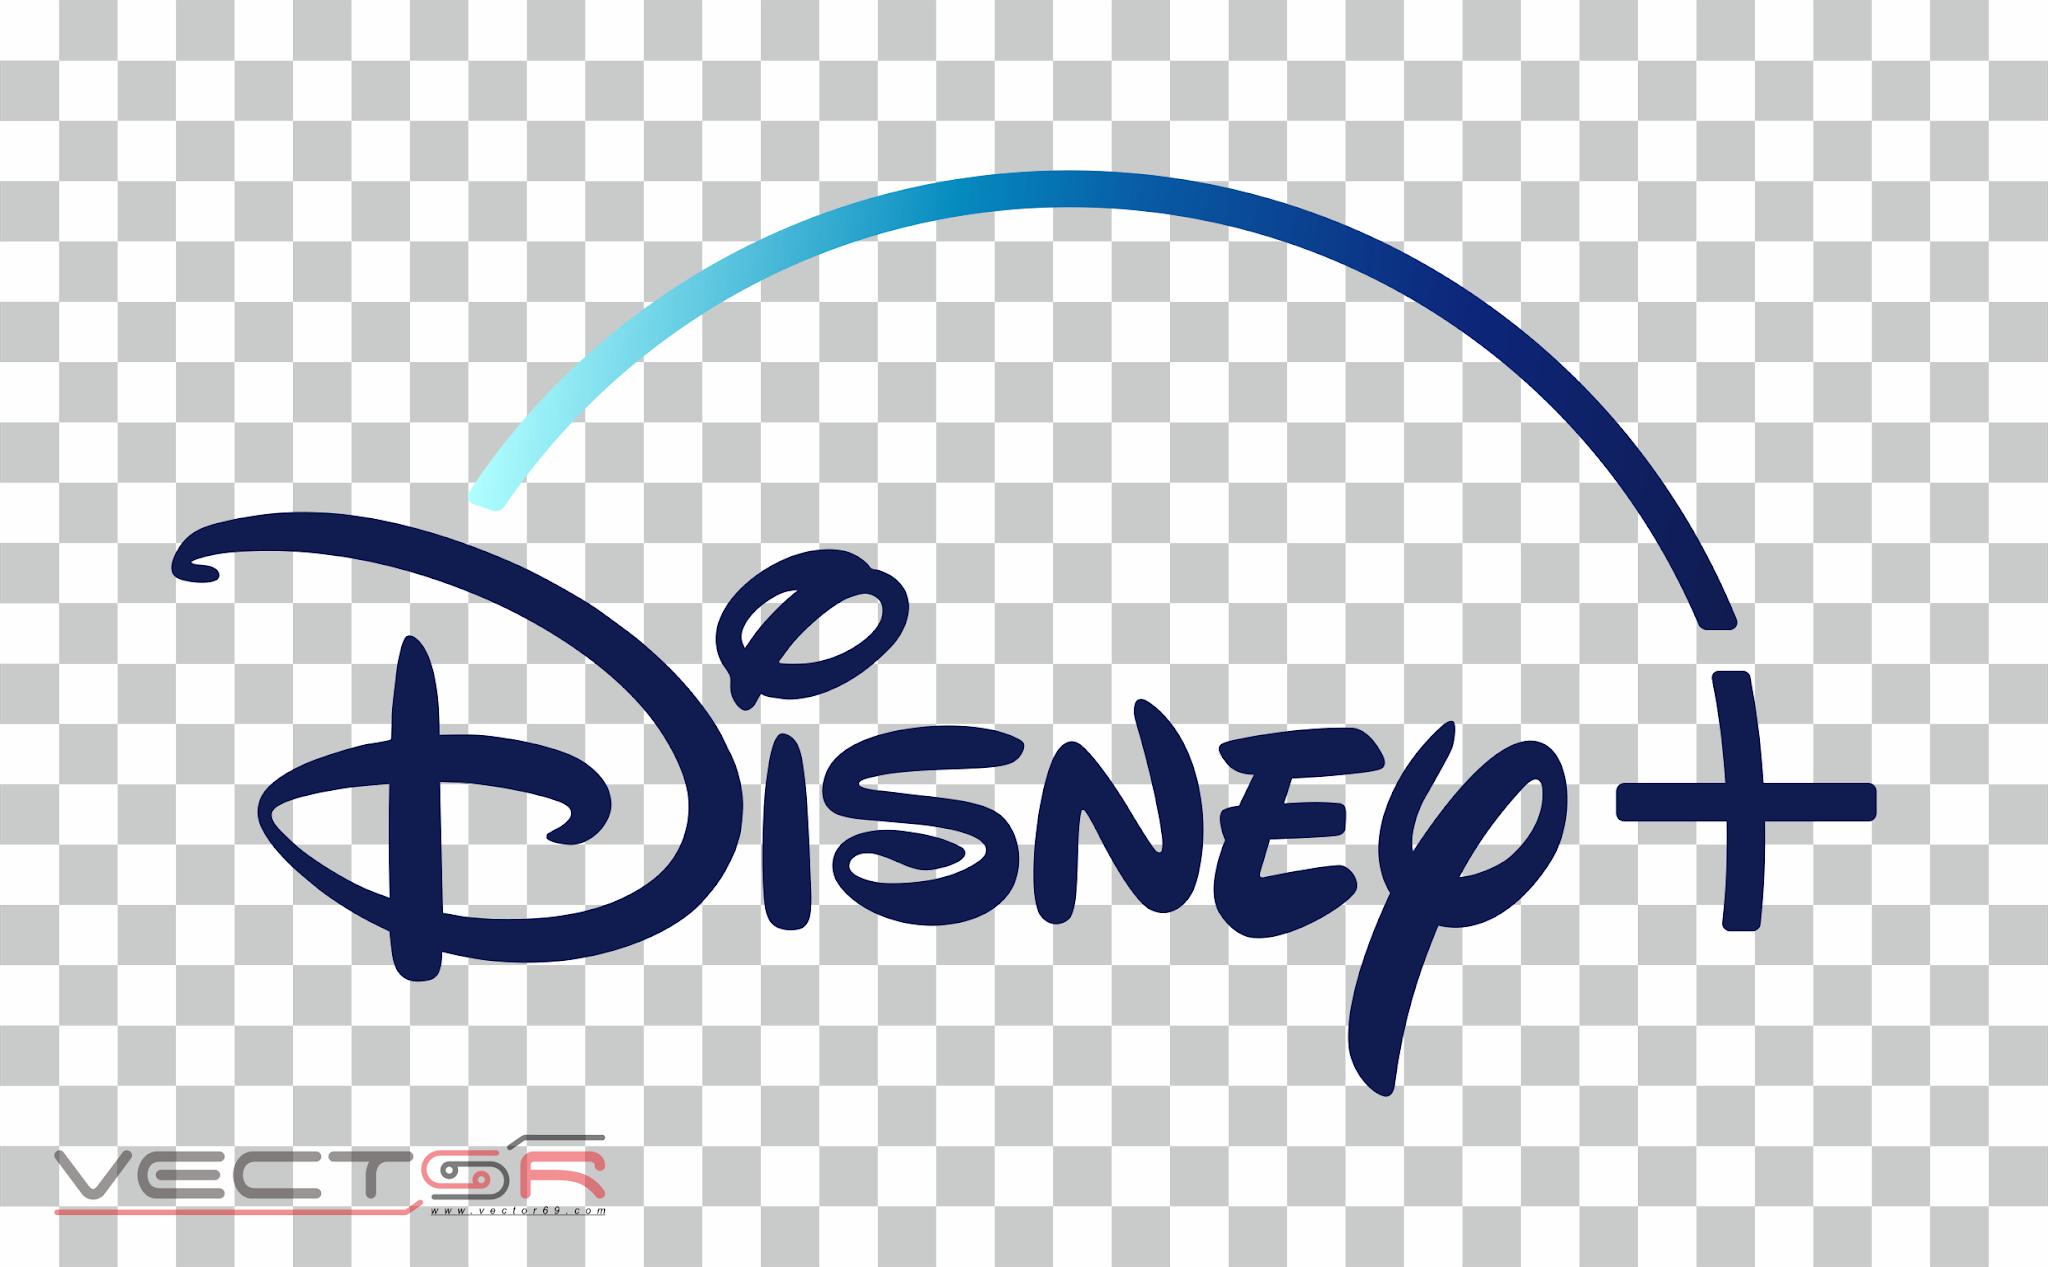 Disney+ Logo - Download .PNG (Portable Network Graphics) Transparent Images